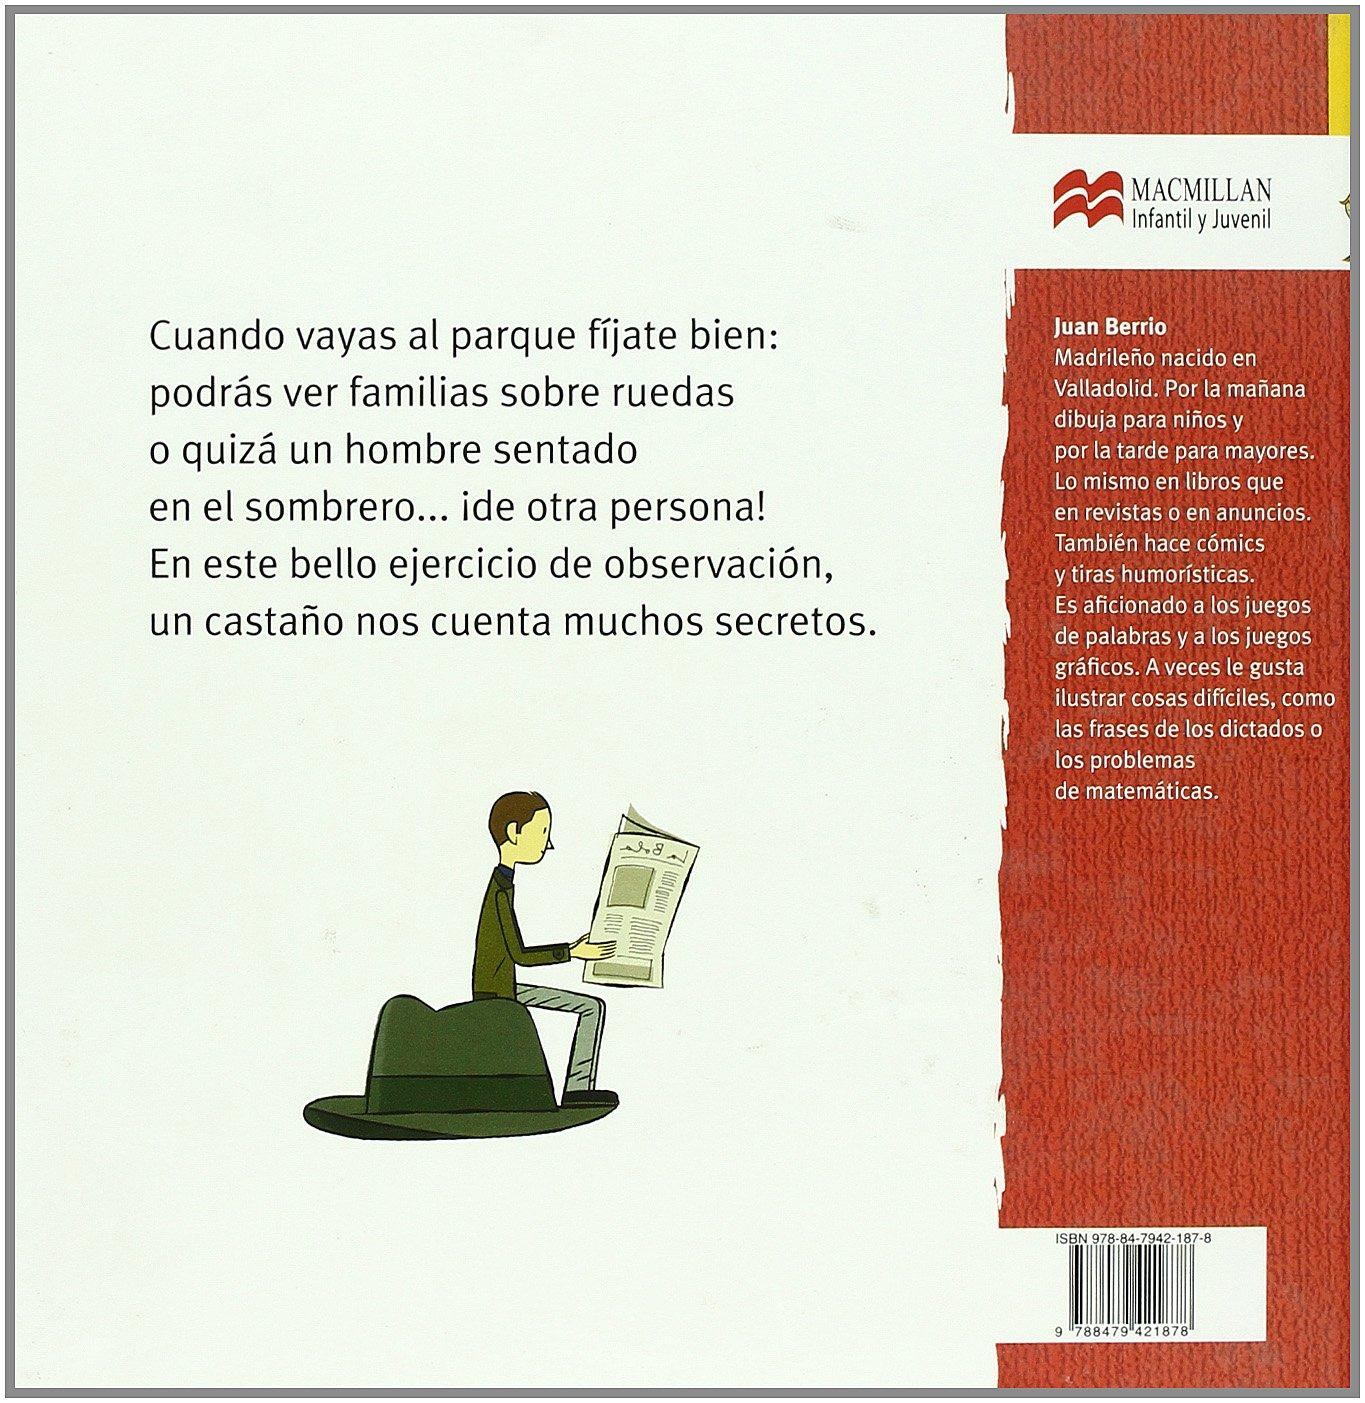 El castaño (Librosaurio) (Spanish Edition): Juan Berrio: 9788479421878: Amazon.com: Books